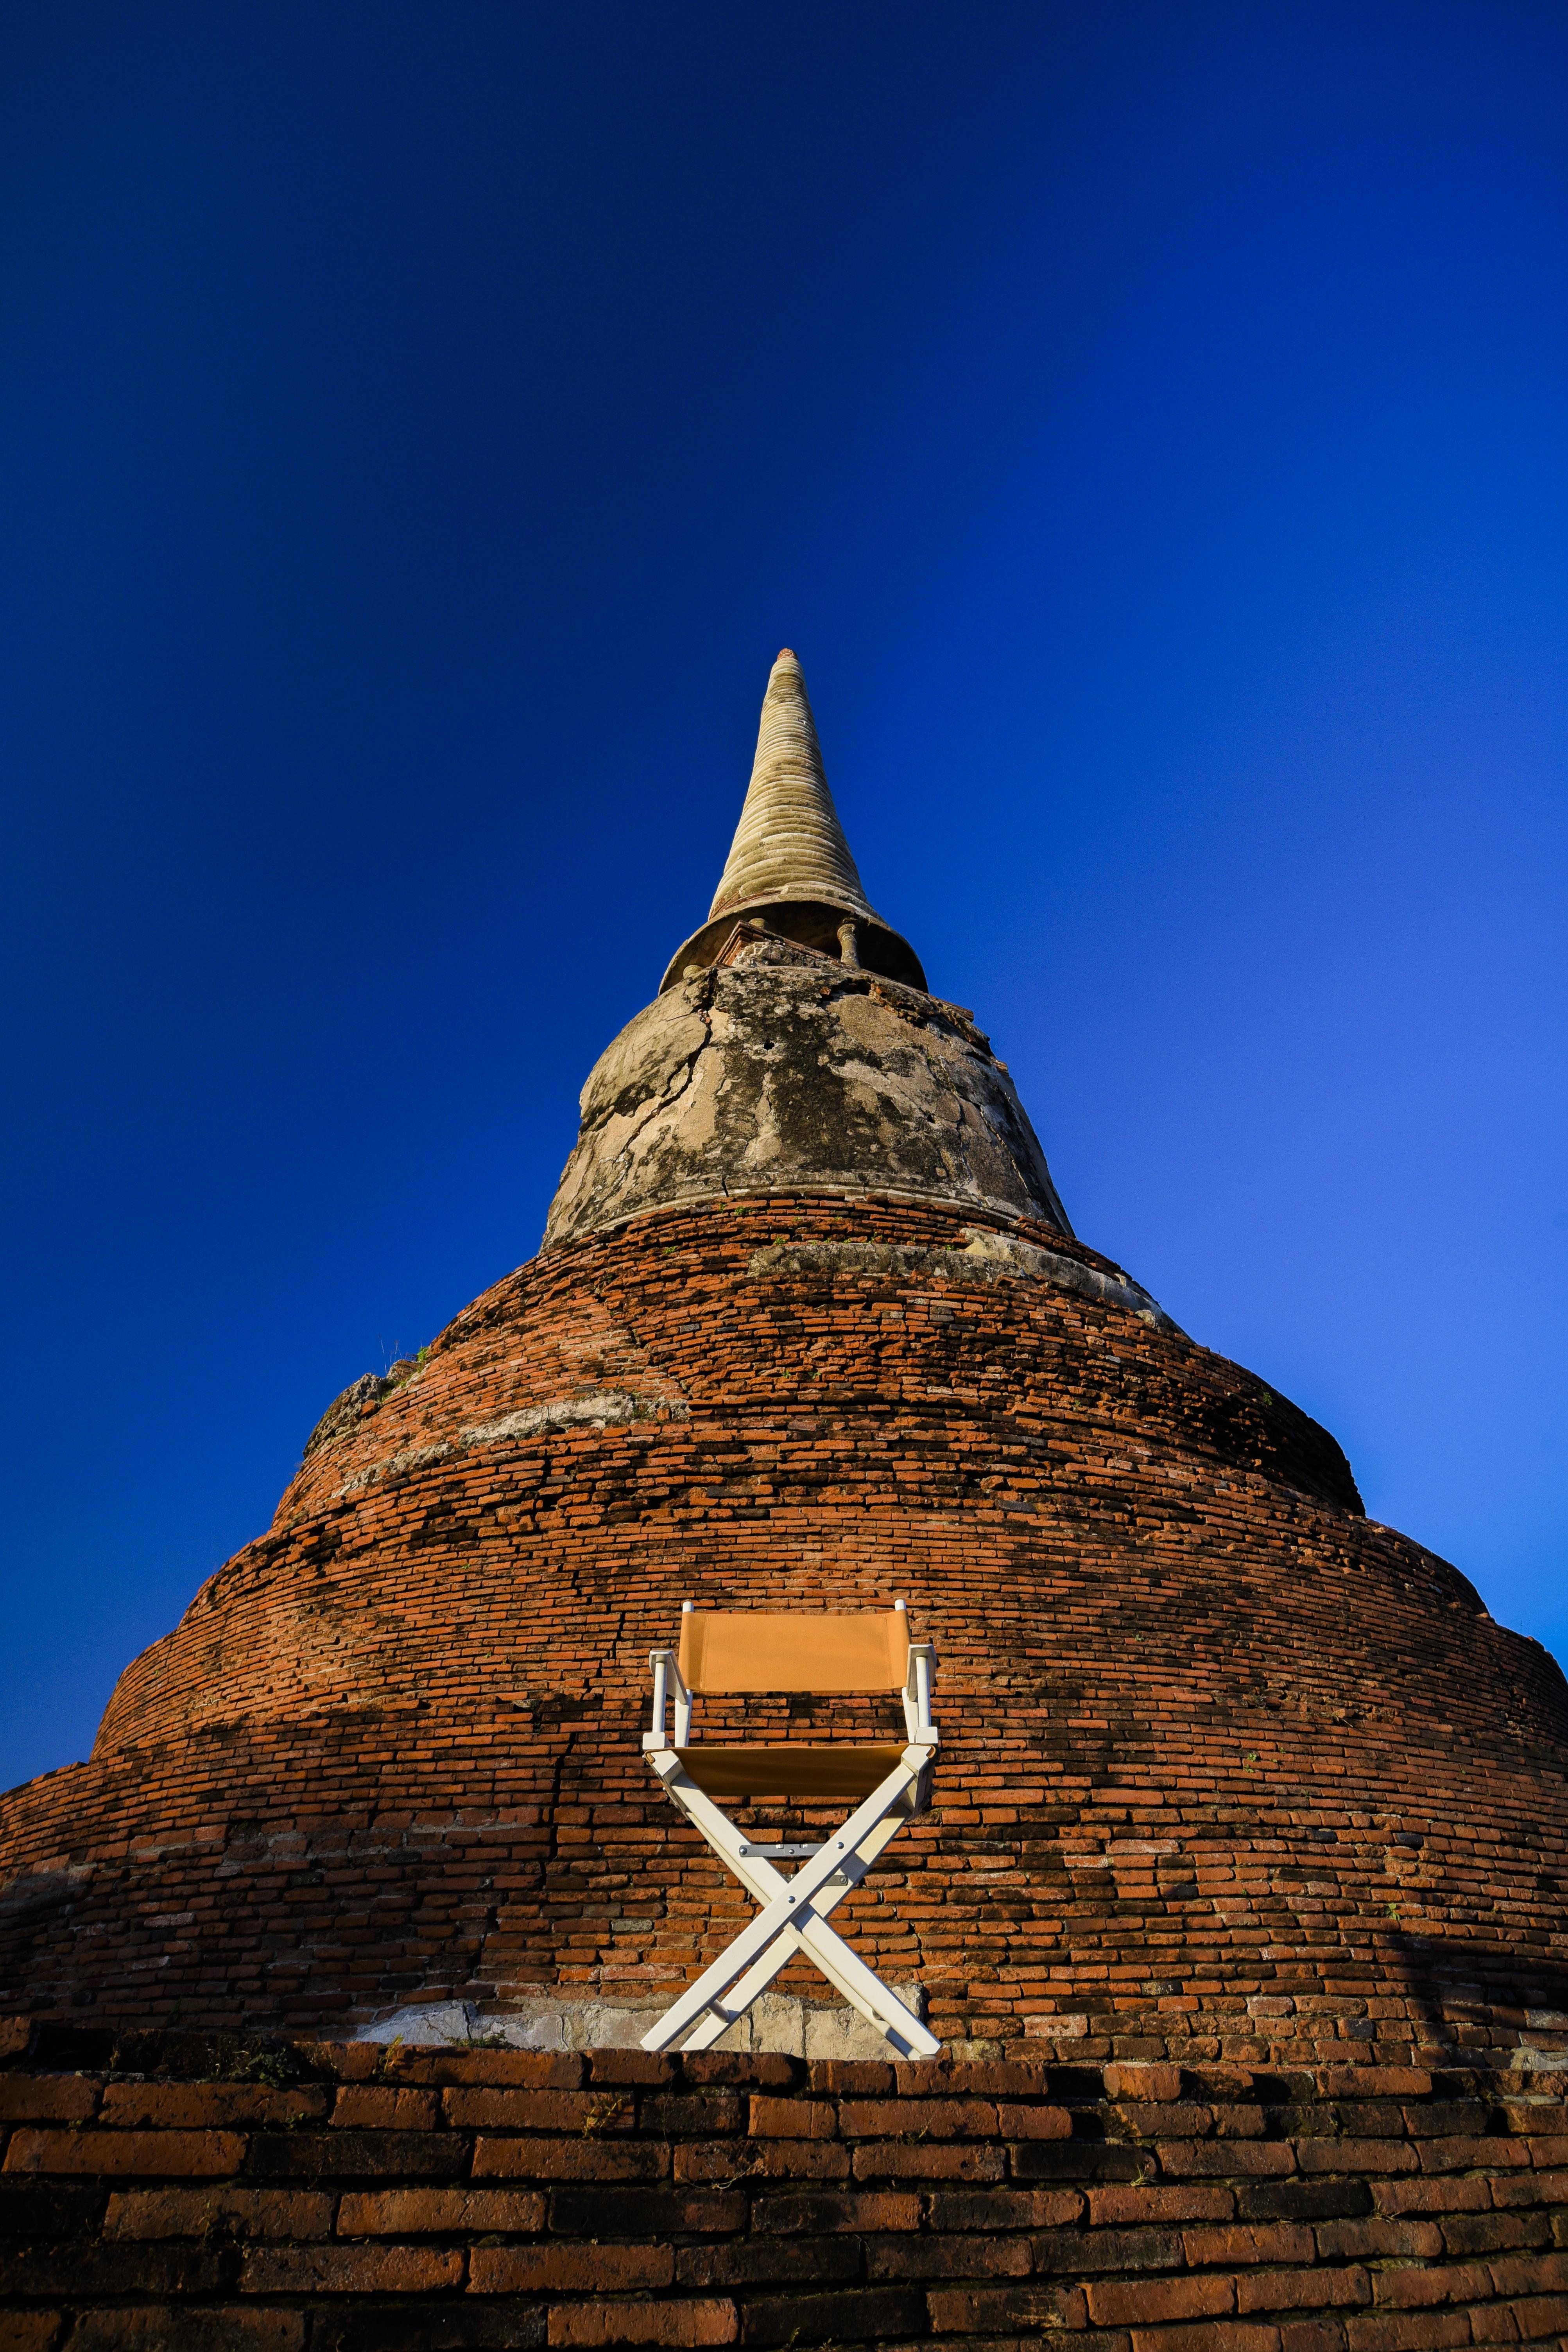 Take Your Seat Thailand